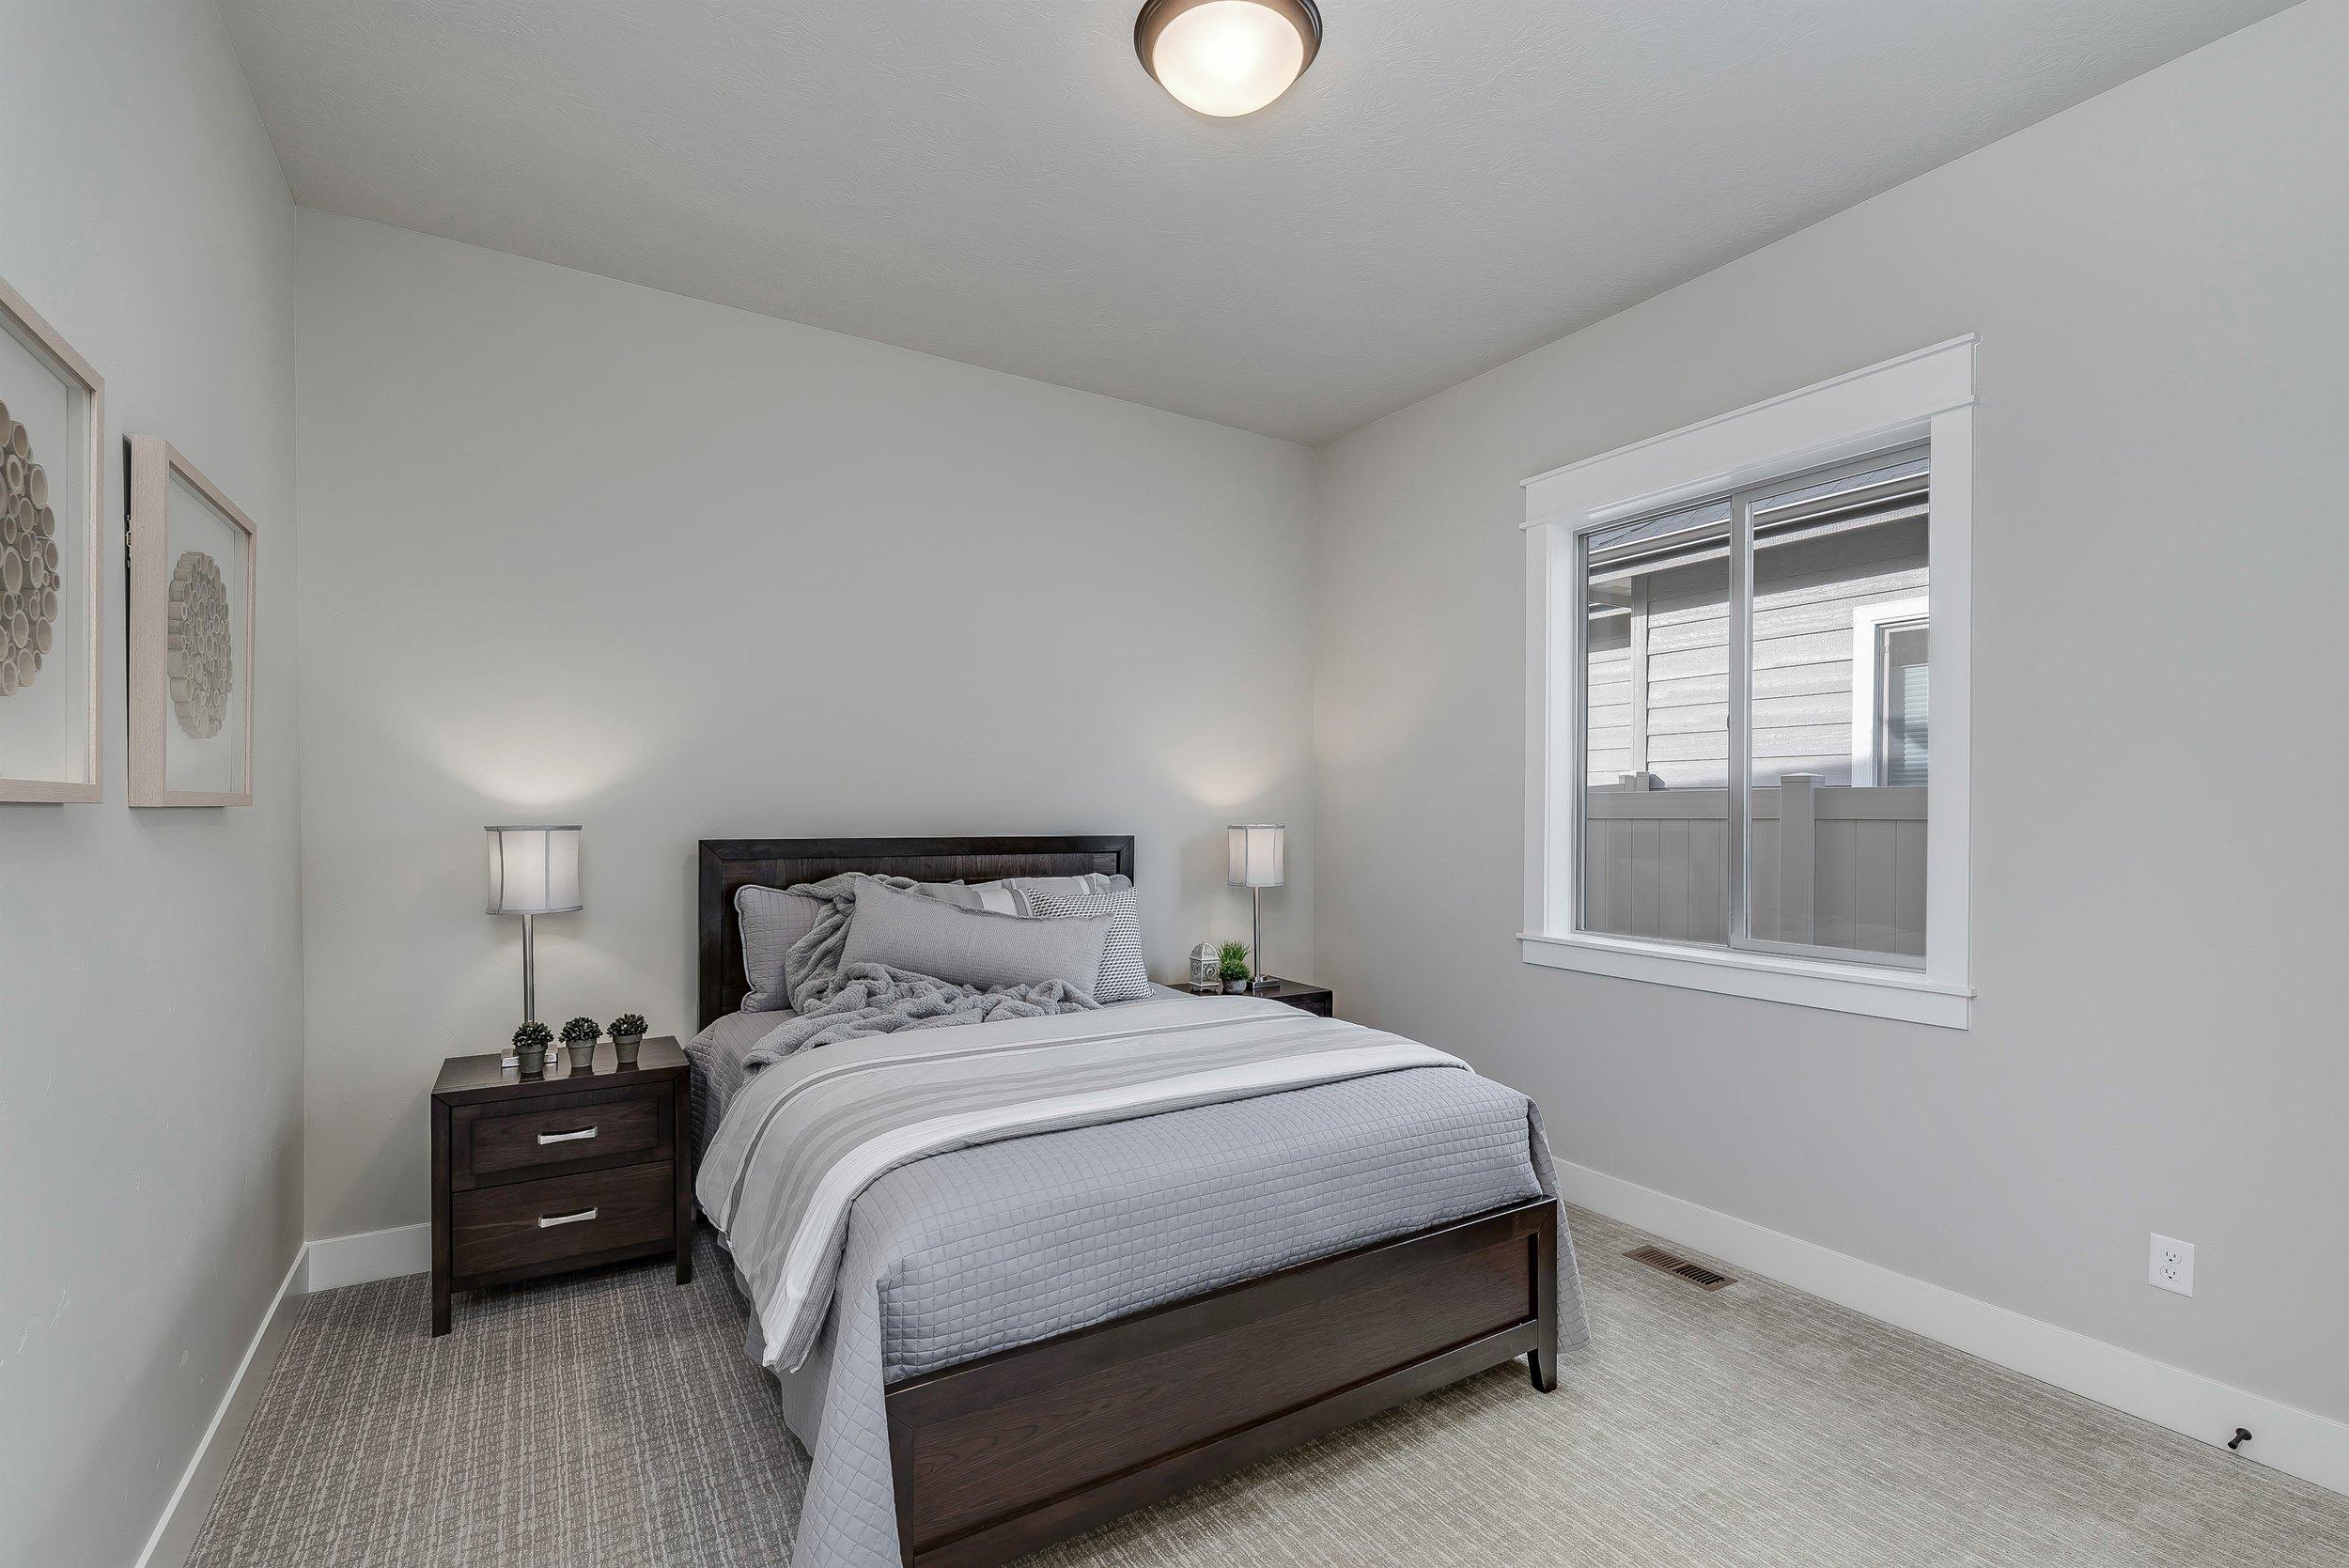 048_Bedroom.jpg